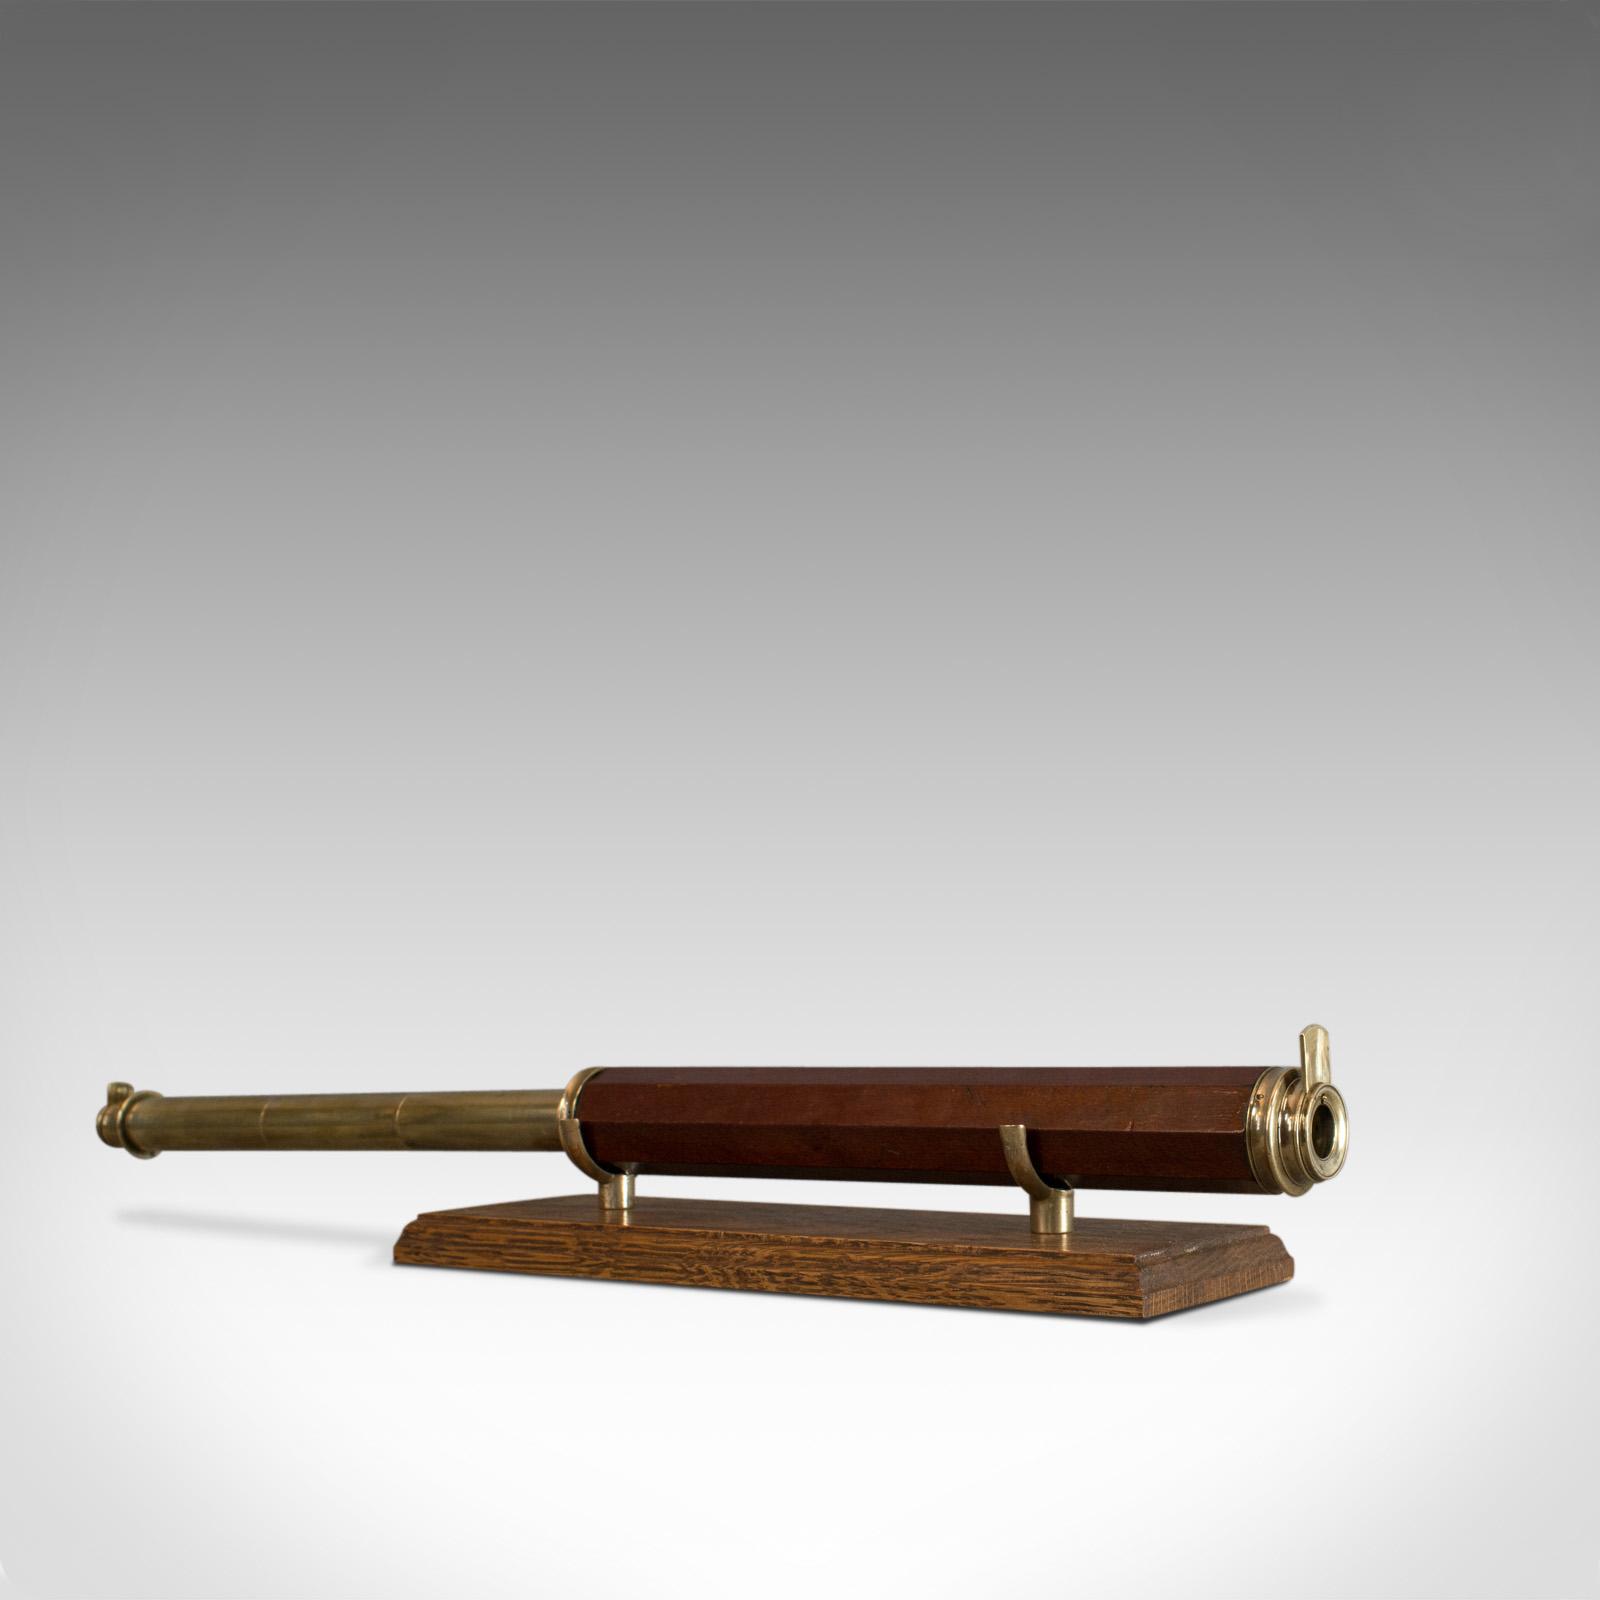 Antique Telescope, English, Single Draw Refractor, Astronomical, Circa 1760